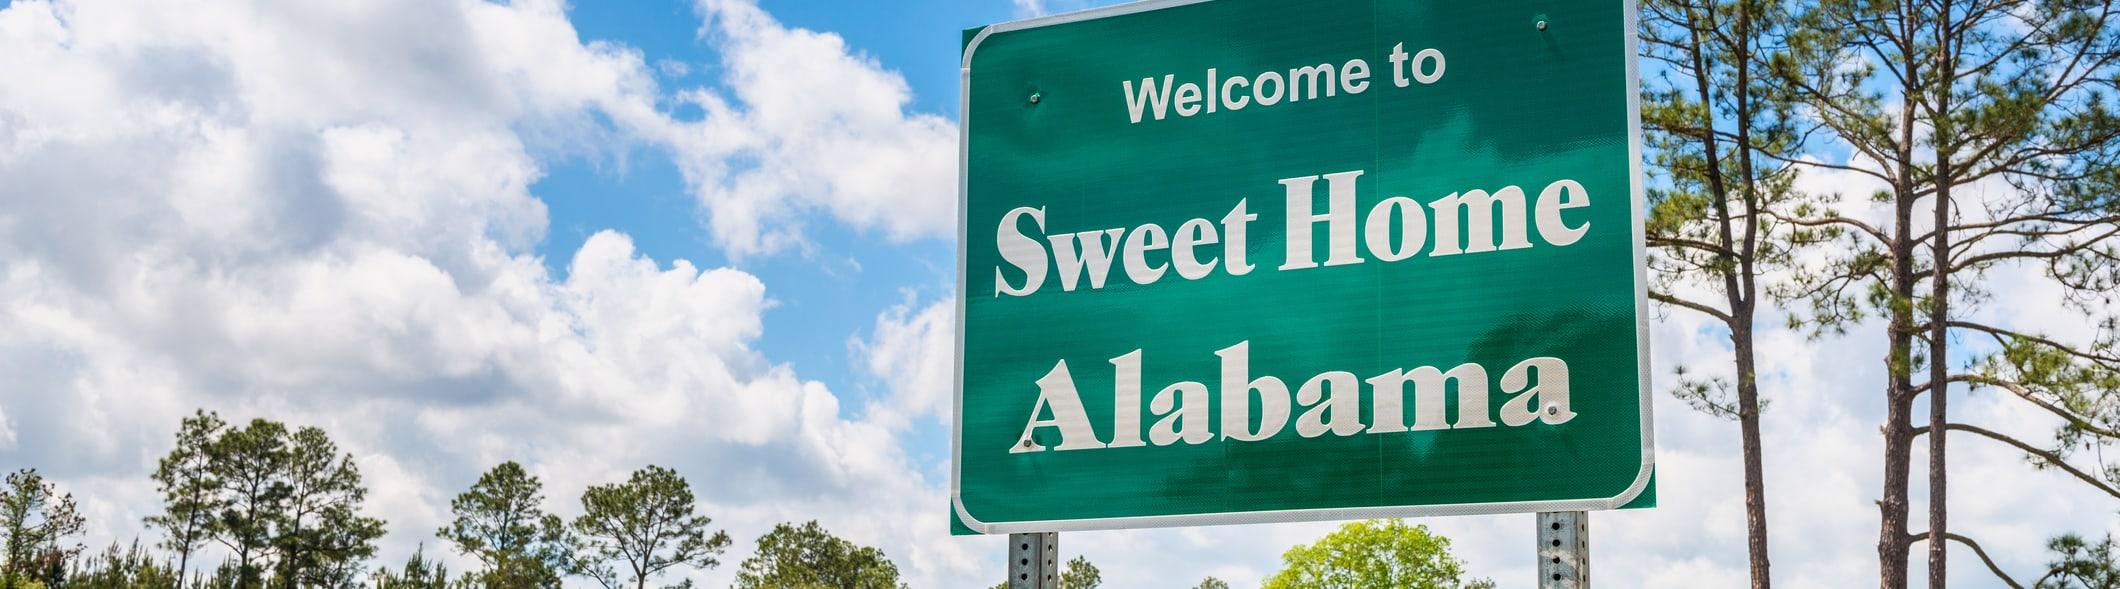 Alabama road sign